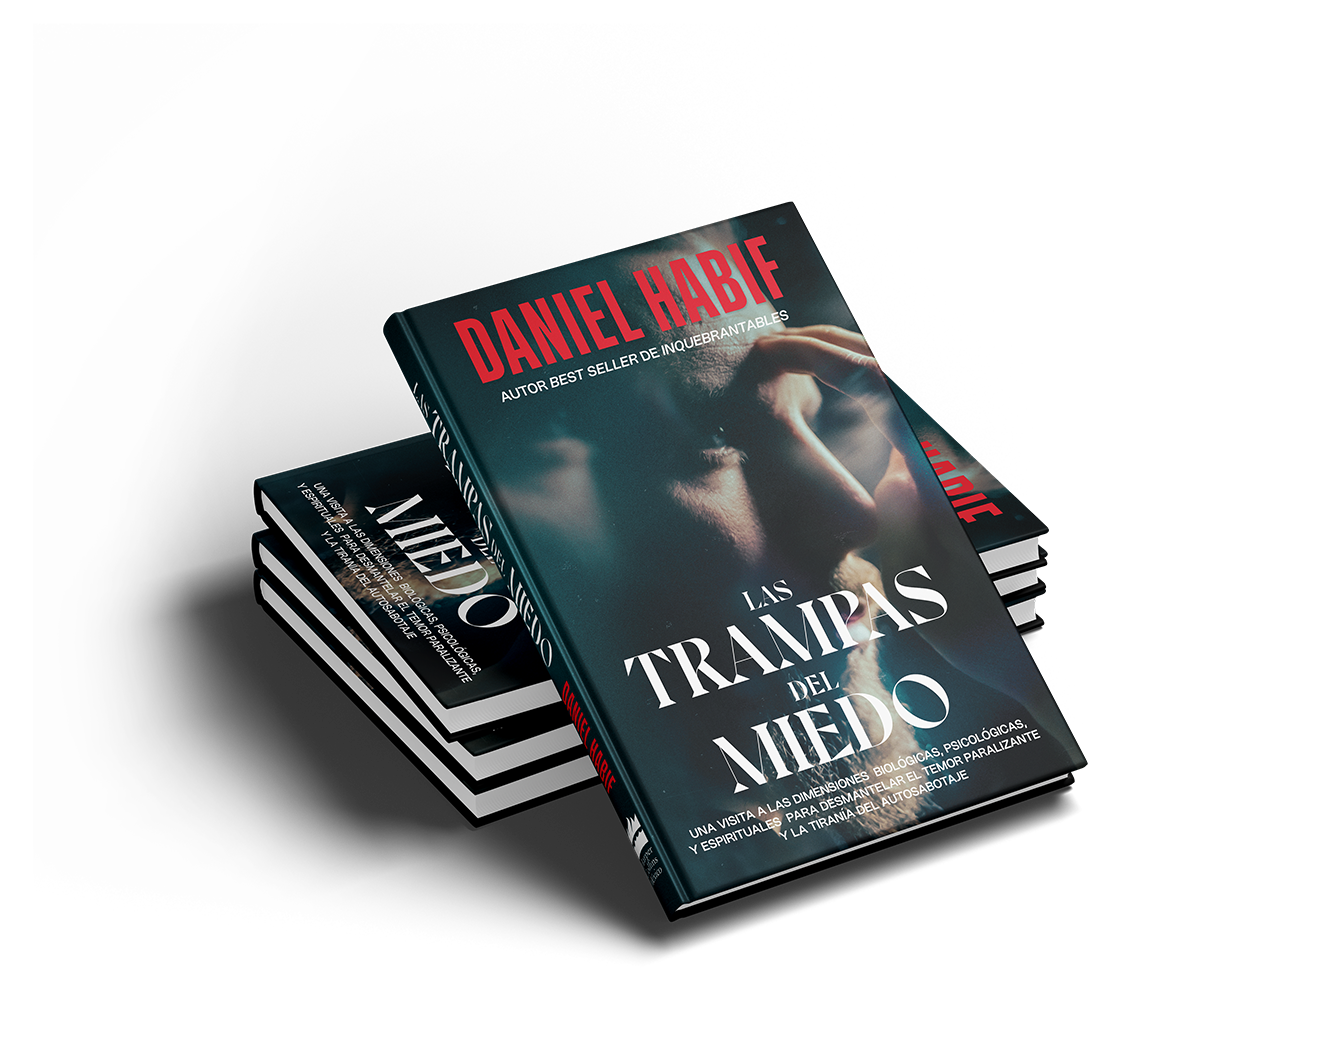 Daniel Habif - Mockups Hardcover -Recovered copy 2